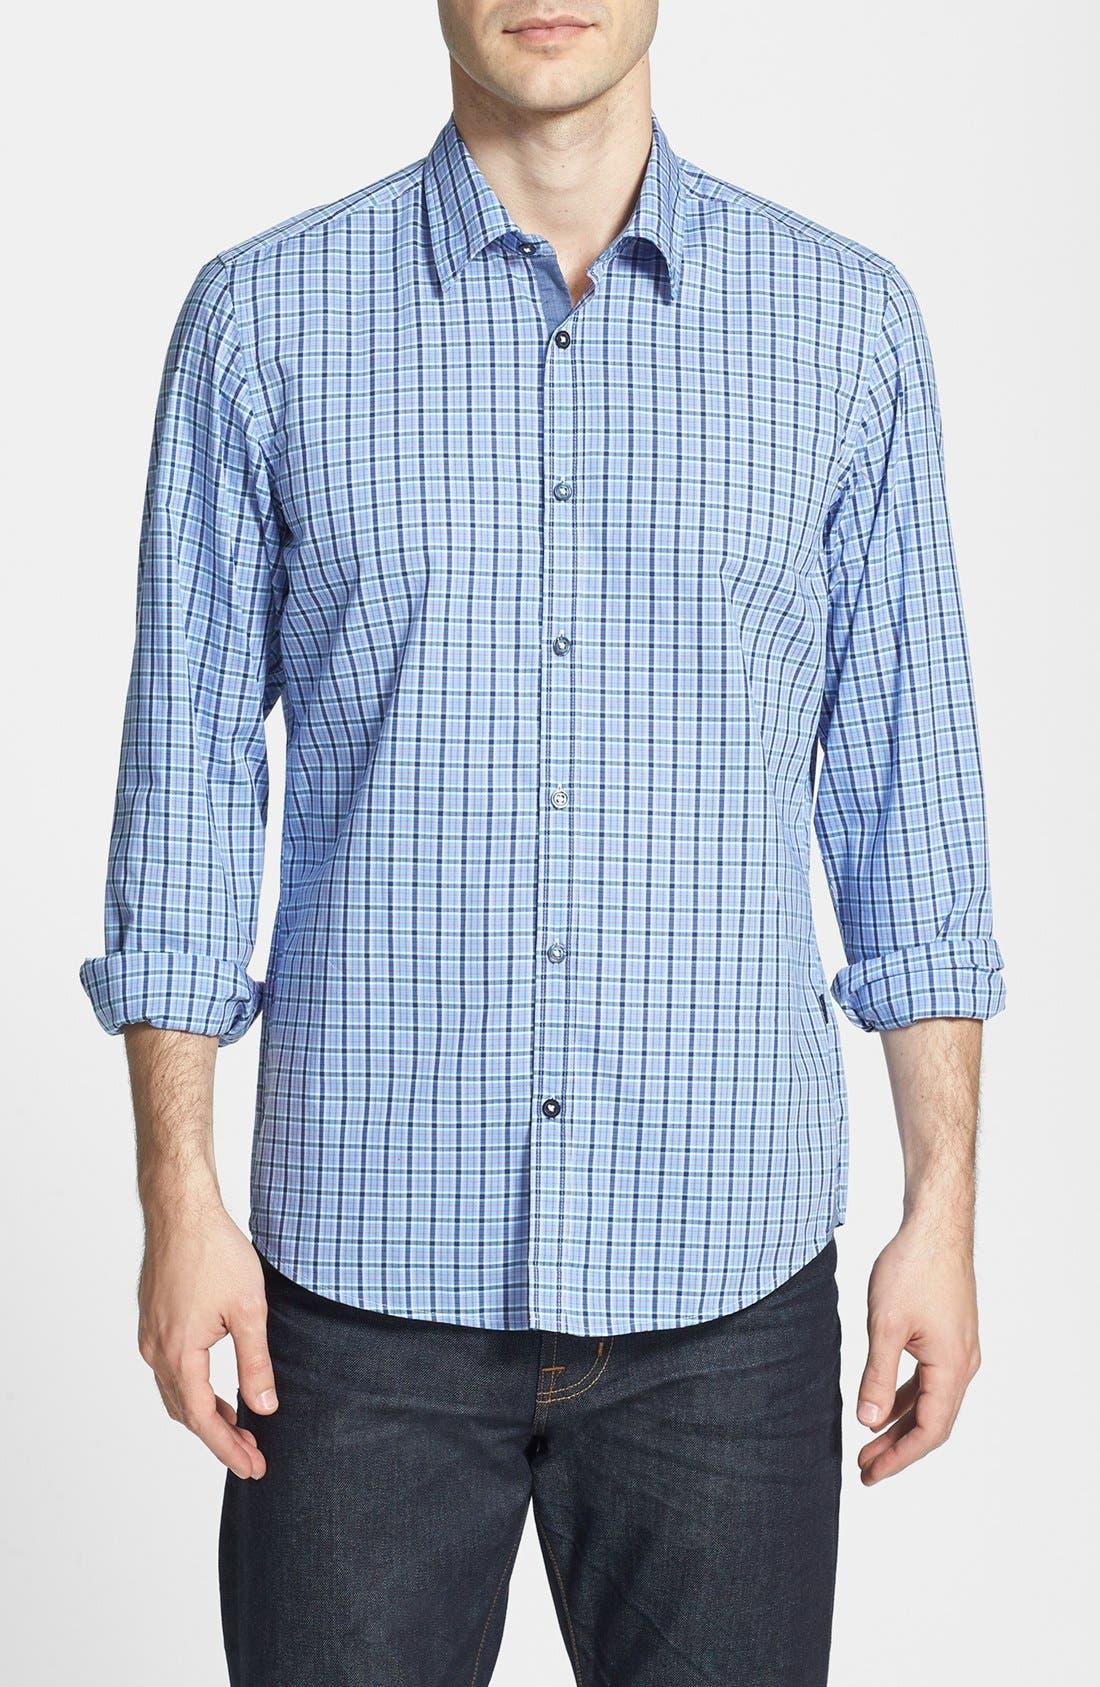 Alternate Image 1 Selected - BOSS HUGO BOSS 'Obert' Plaid Sport Shirt